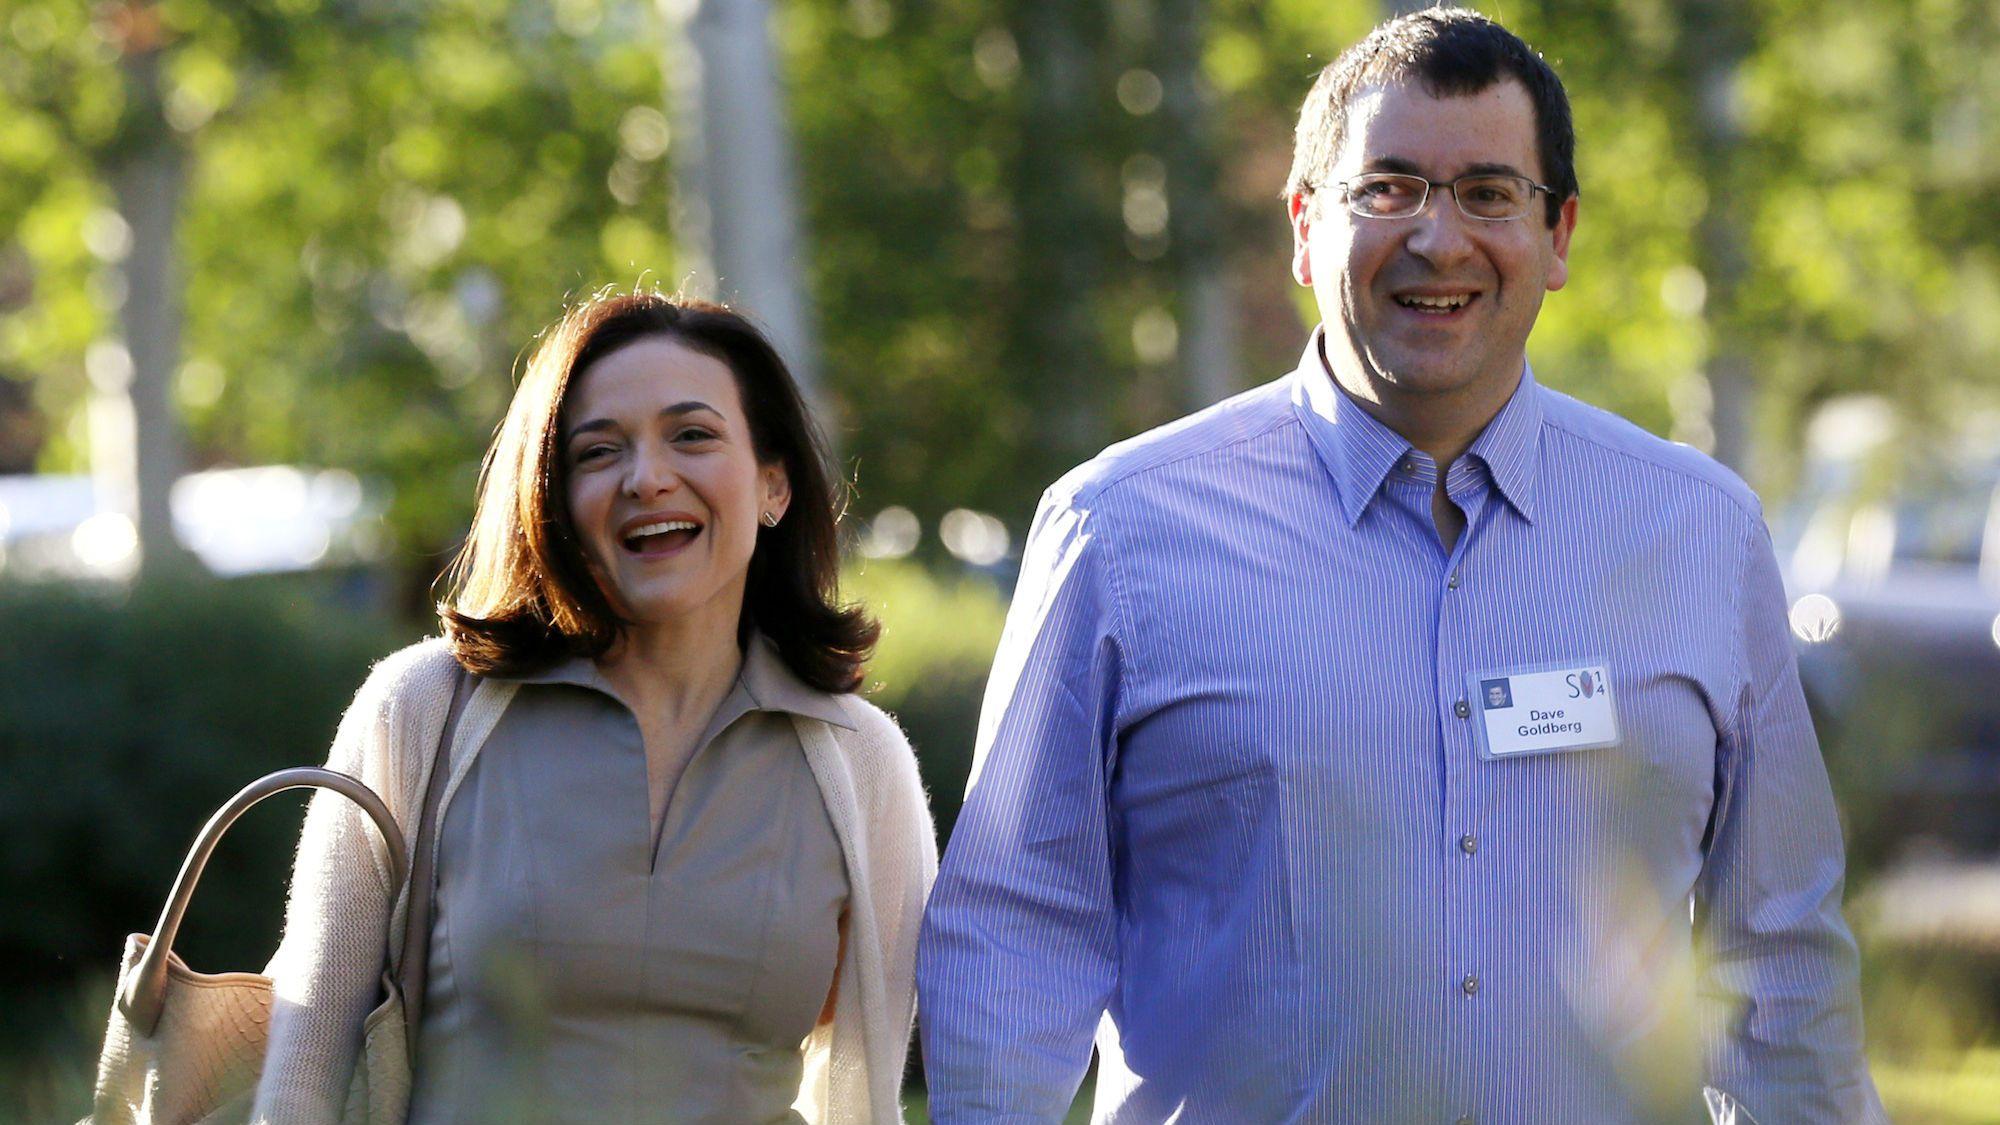 Sheryl Sandberg and Dave Goldberg in Sun Valley, Idaho in 2013.